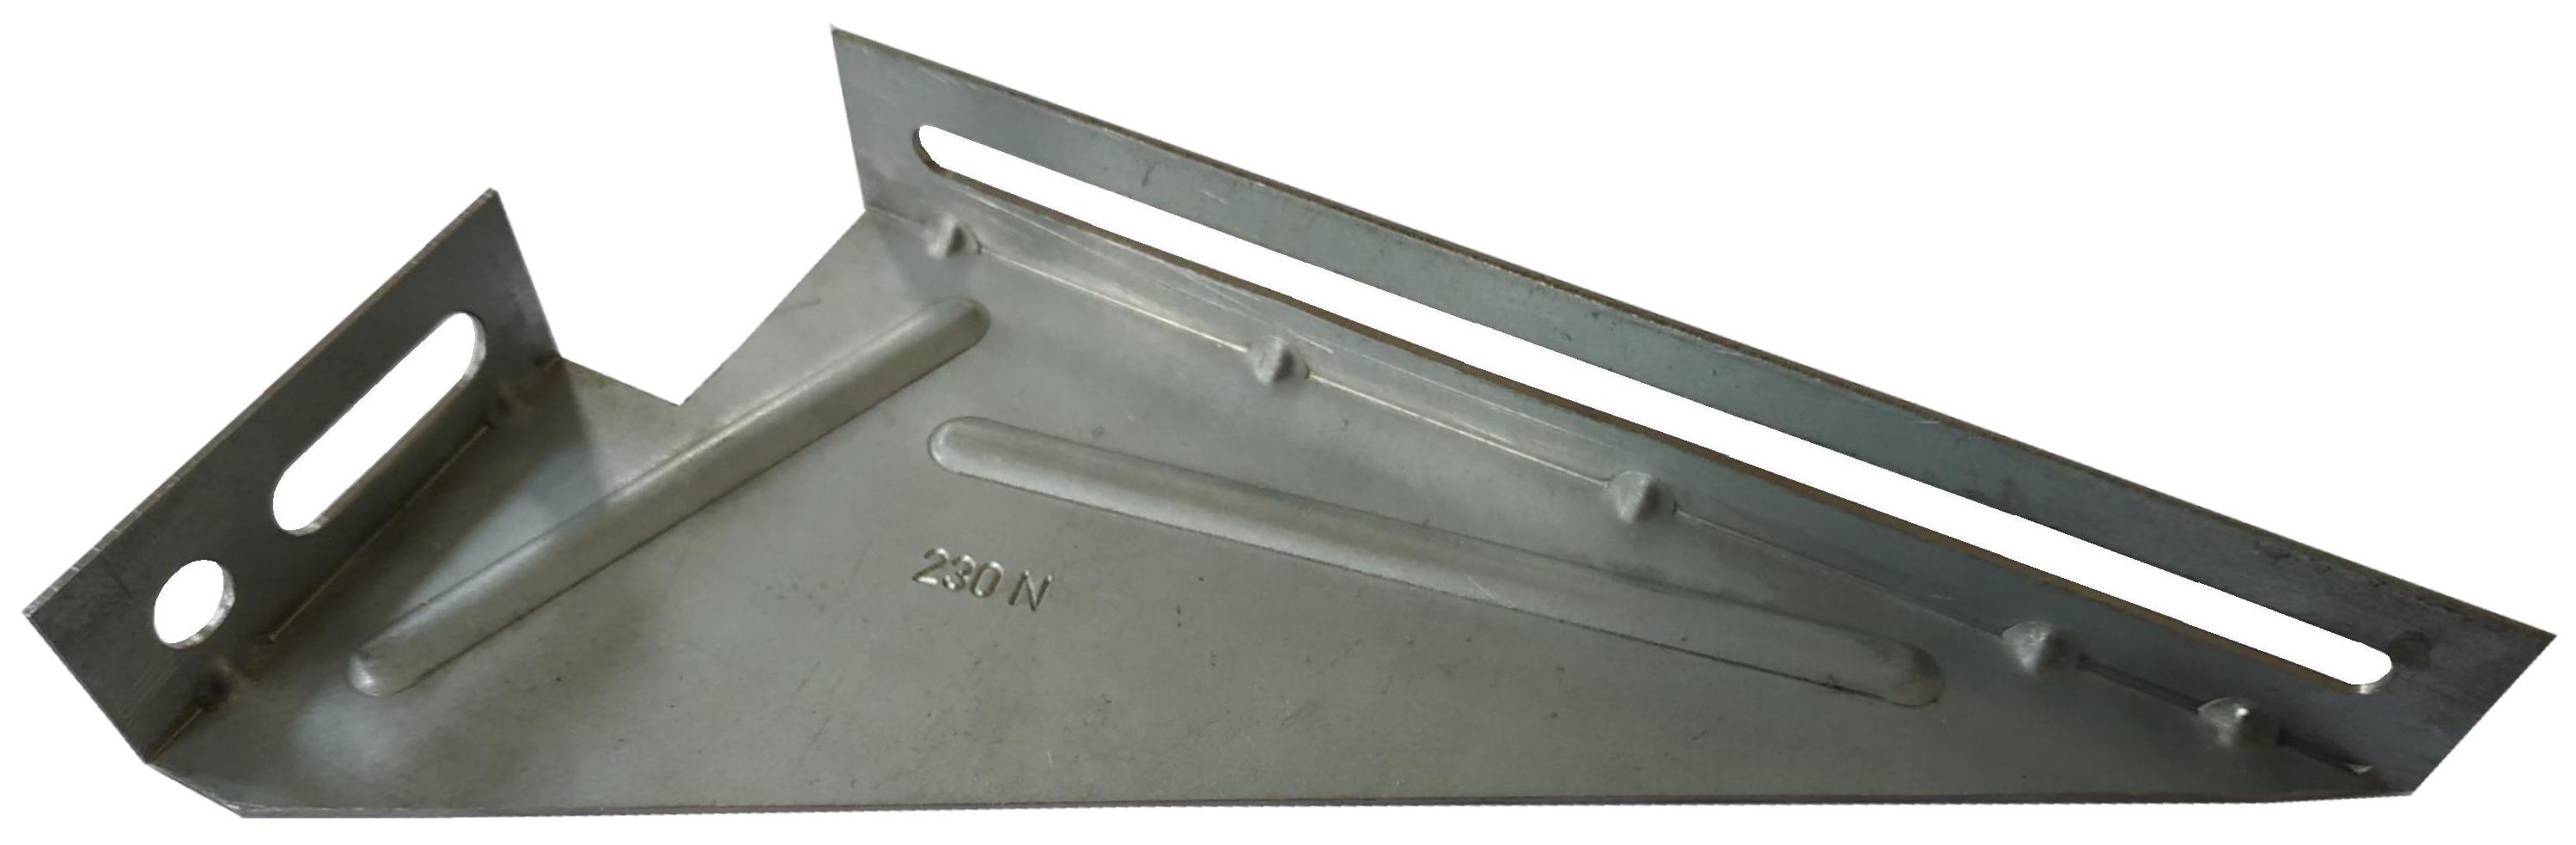 Patte a gousset isolation 200 mm